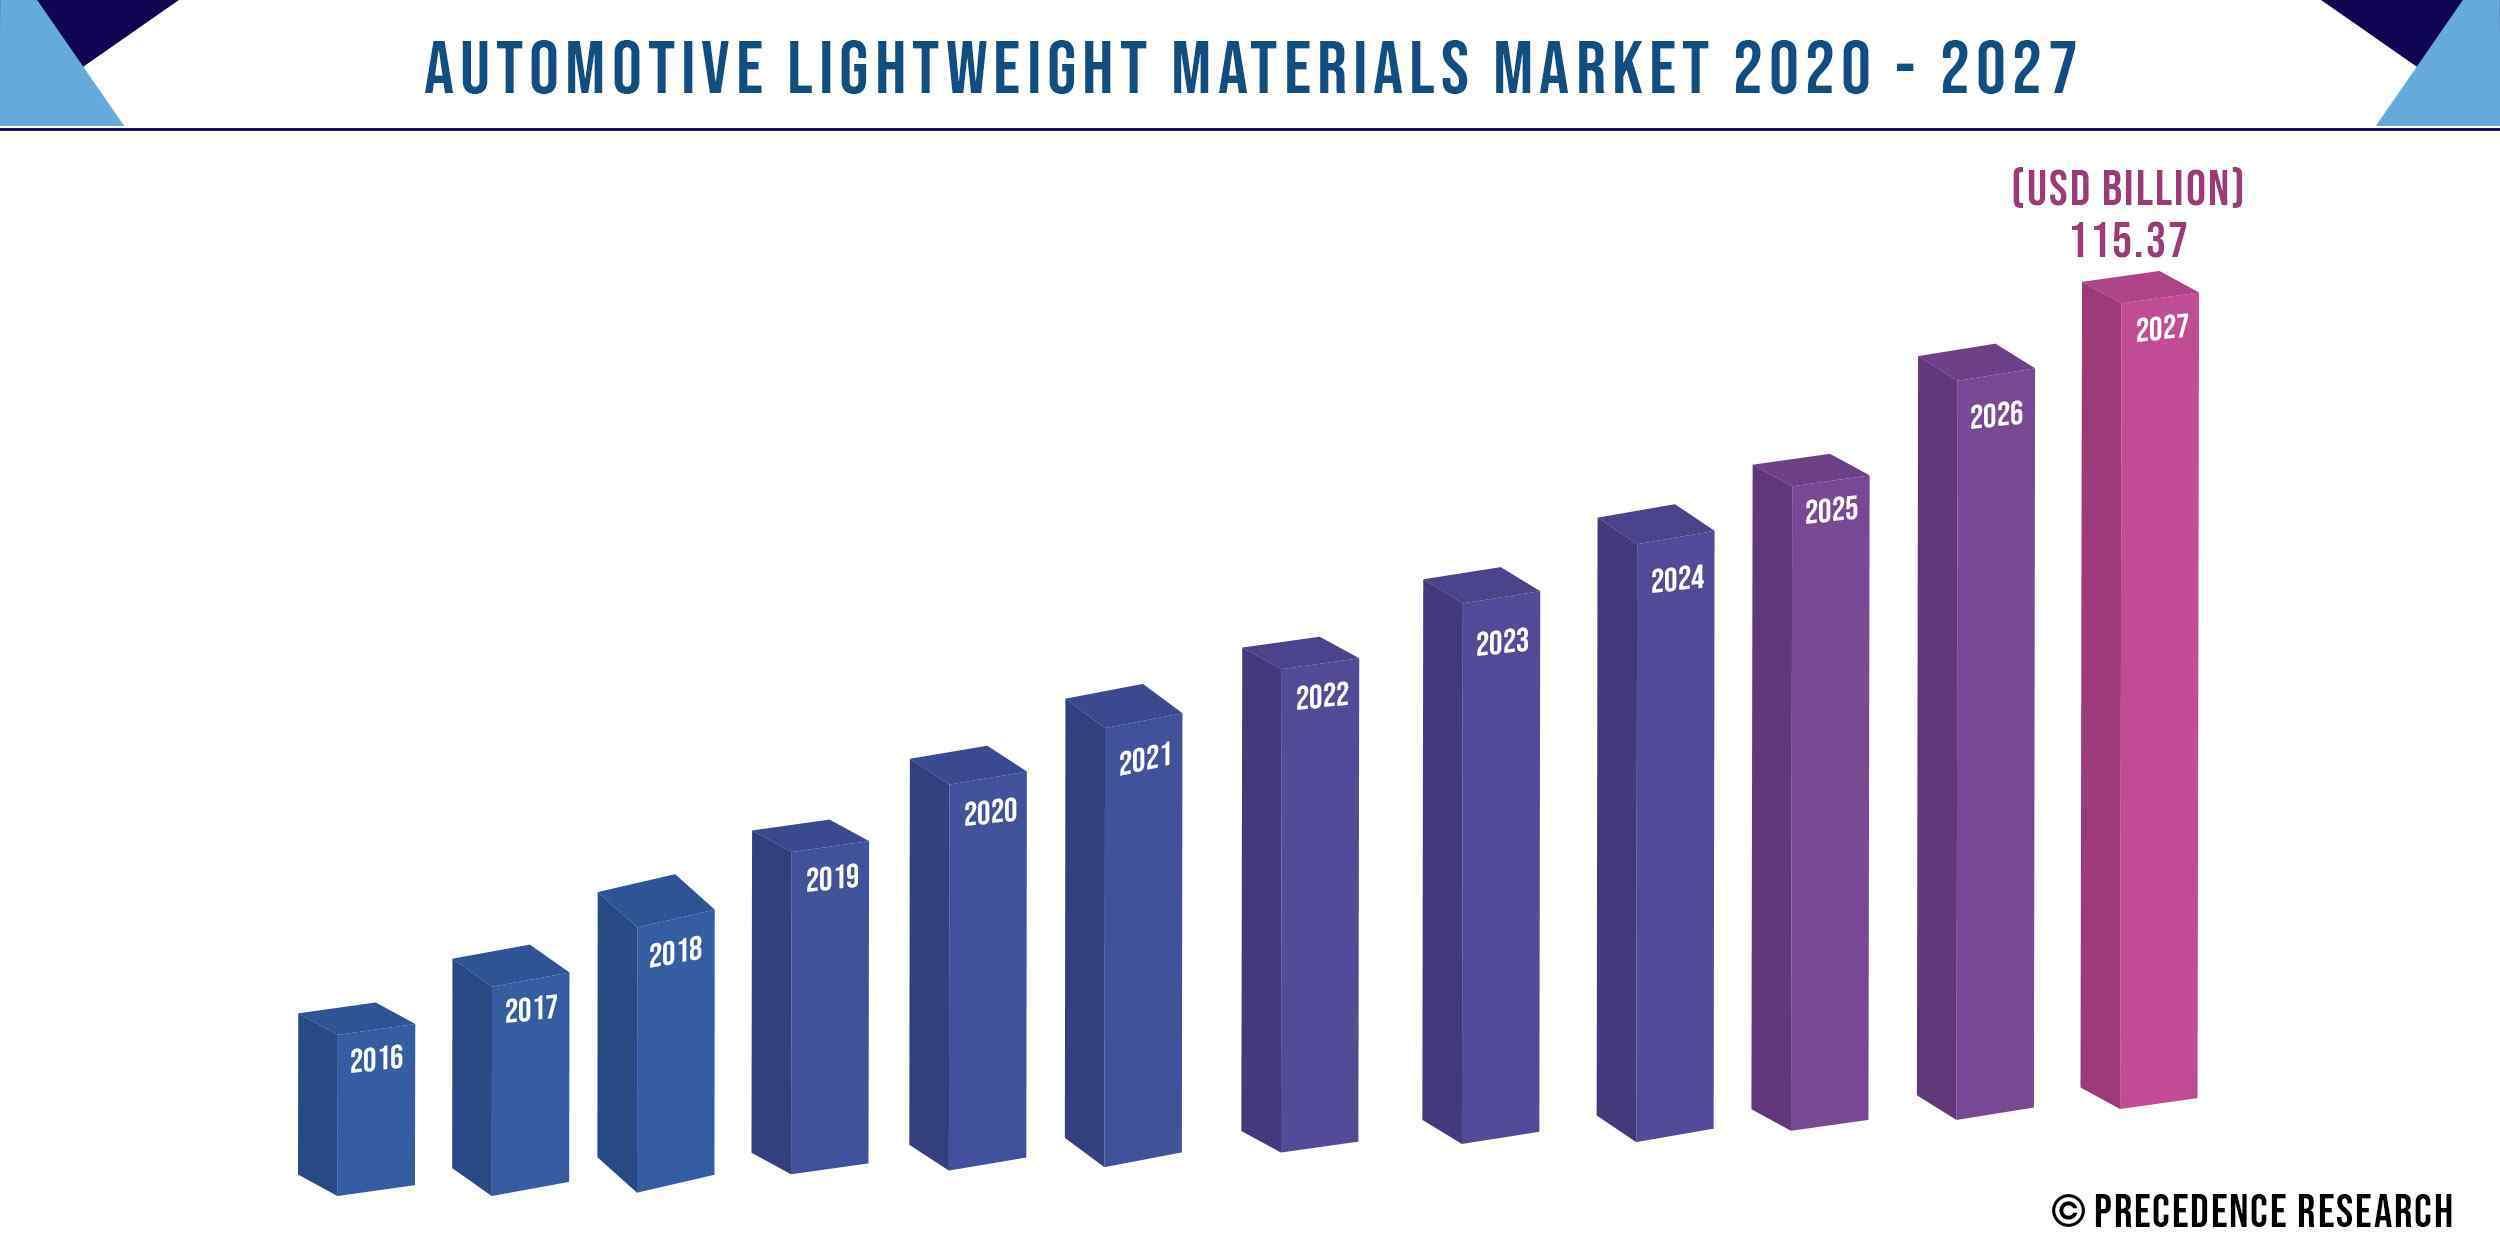 Automotive Lightweight Materials Market Size 2016-2027